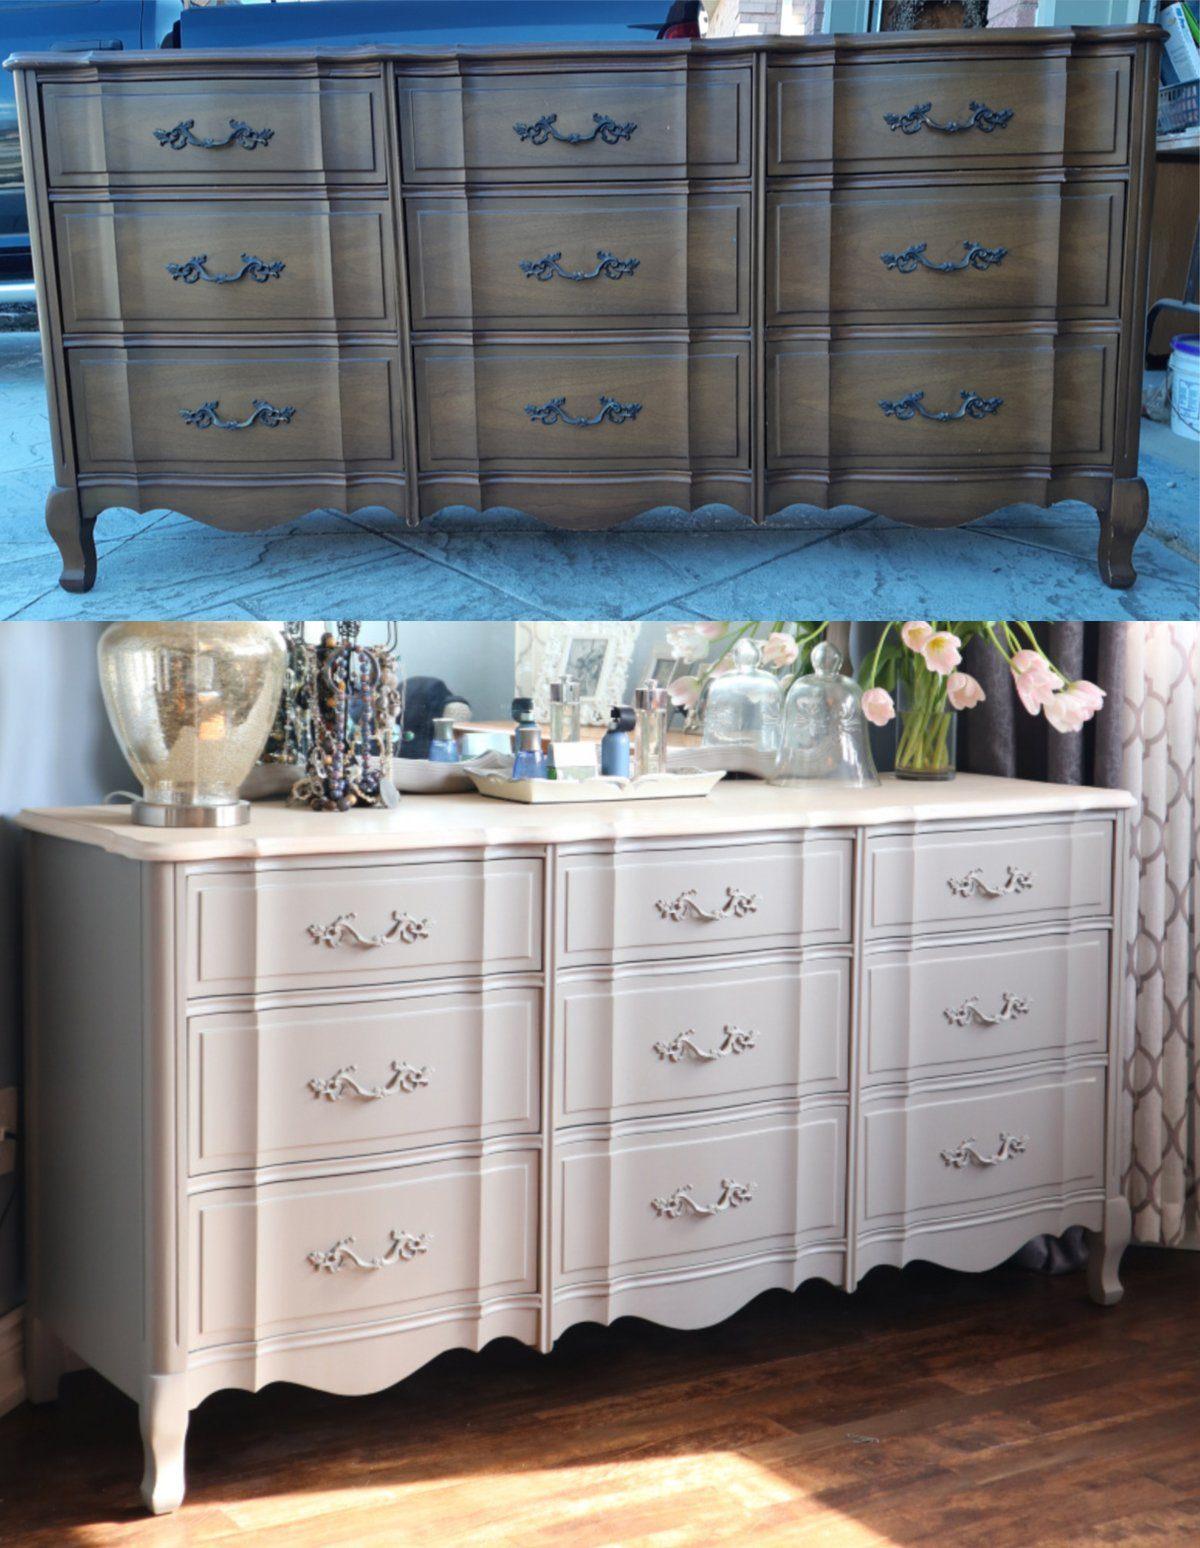 quarantine transformations: furniture